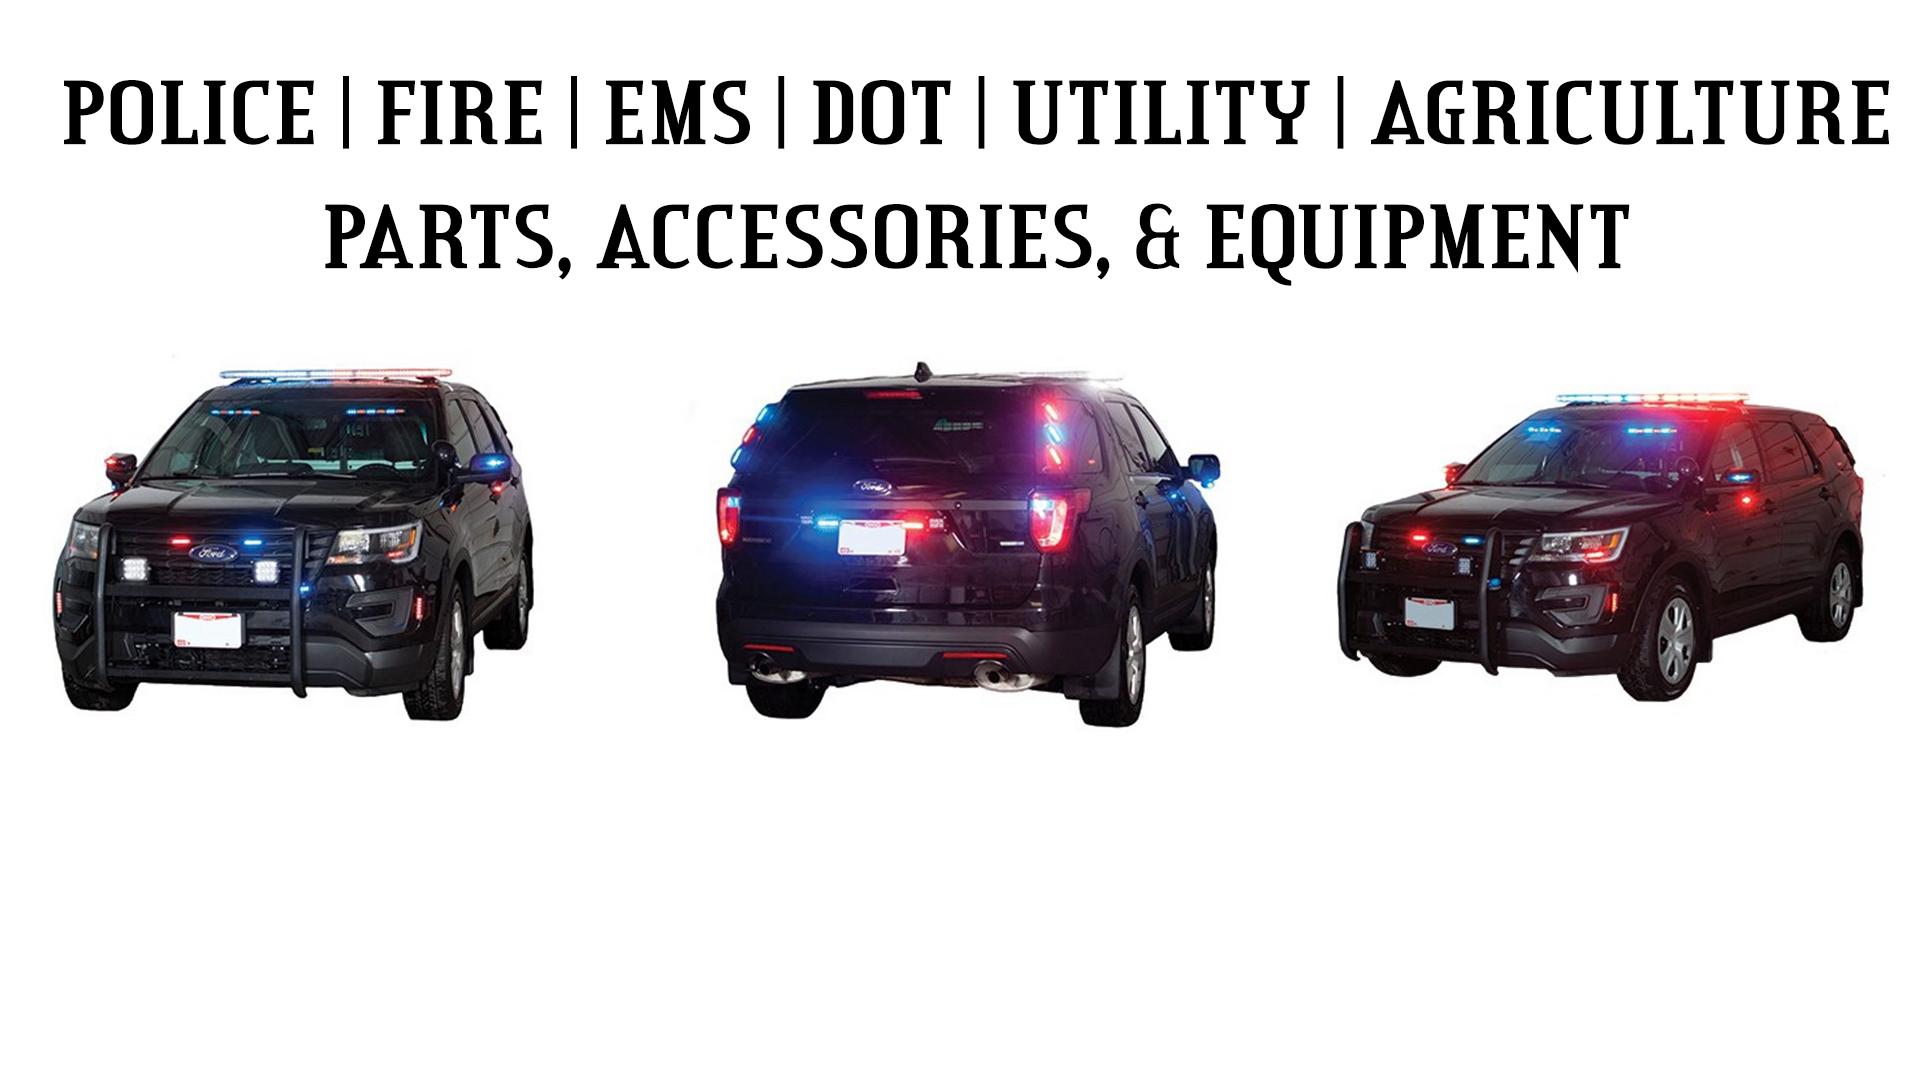 PublicSafetyEquipmentPSGAutomotiveOutfitters